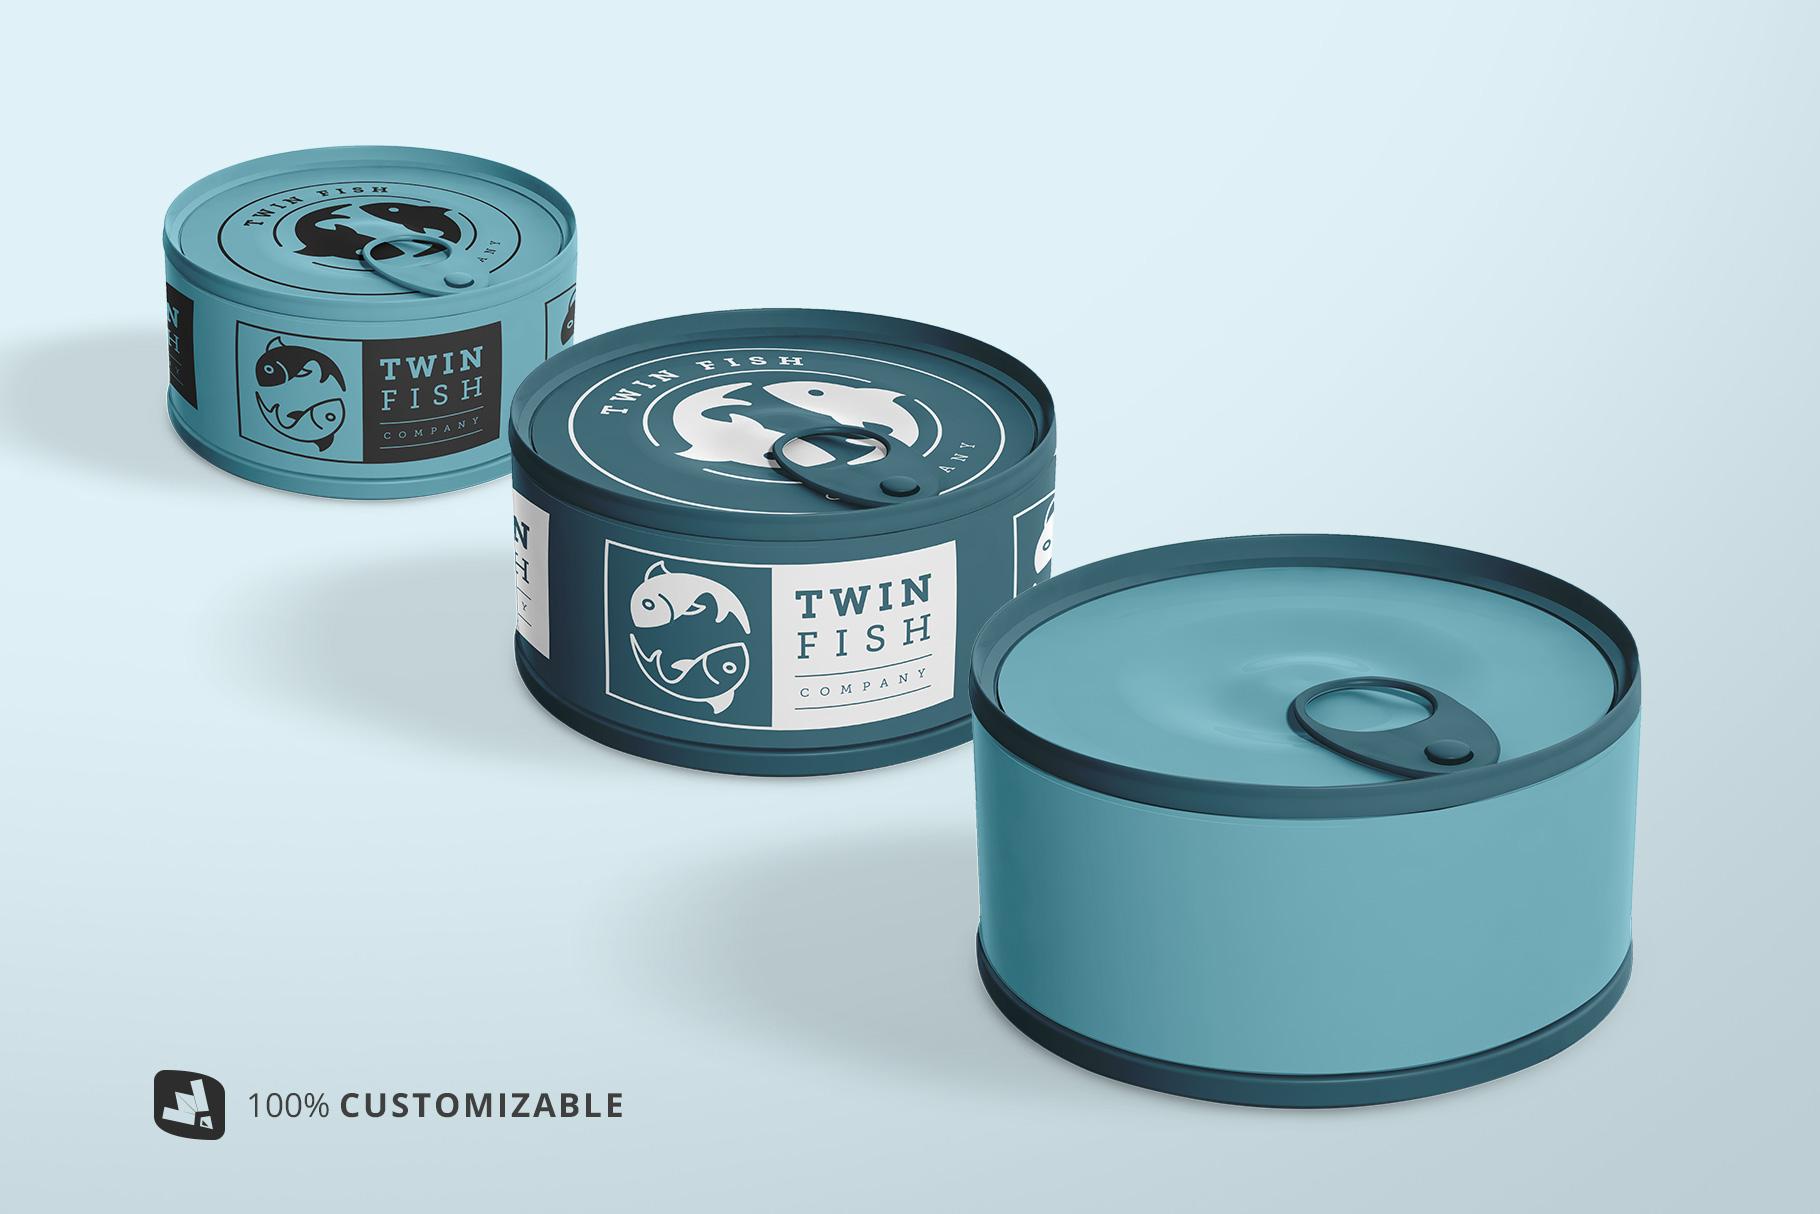 100% customizable circular canned food packaging mockup